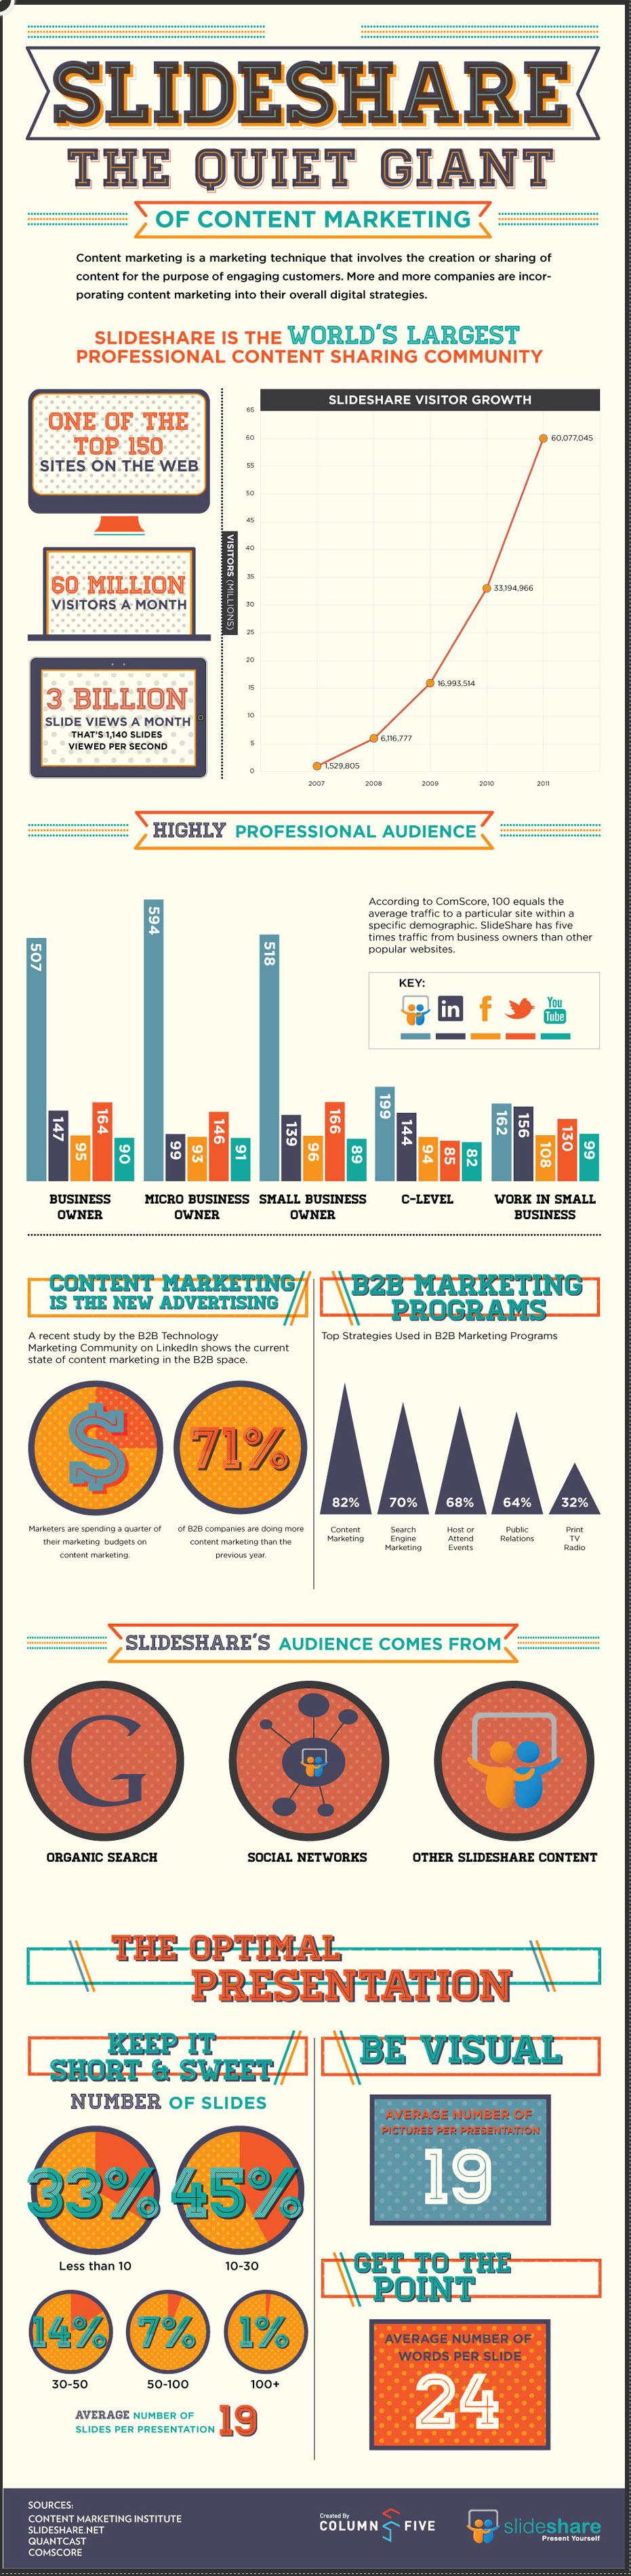 Content Marketing On SlideShare [INFOGRAPHIC]